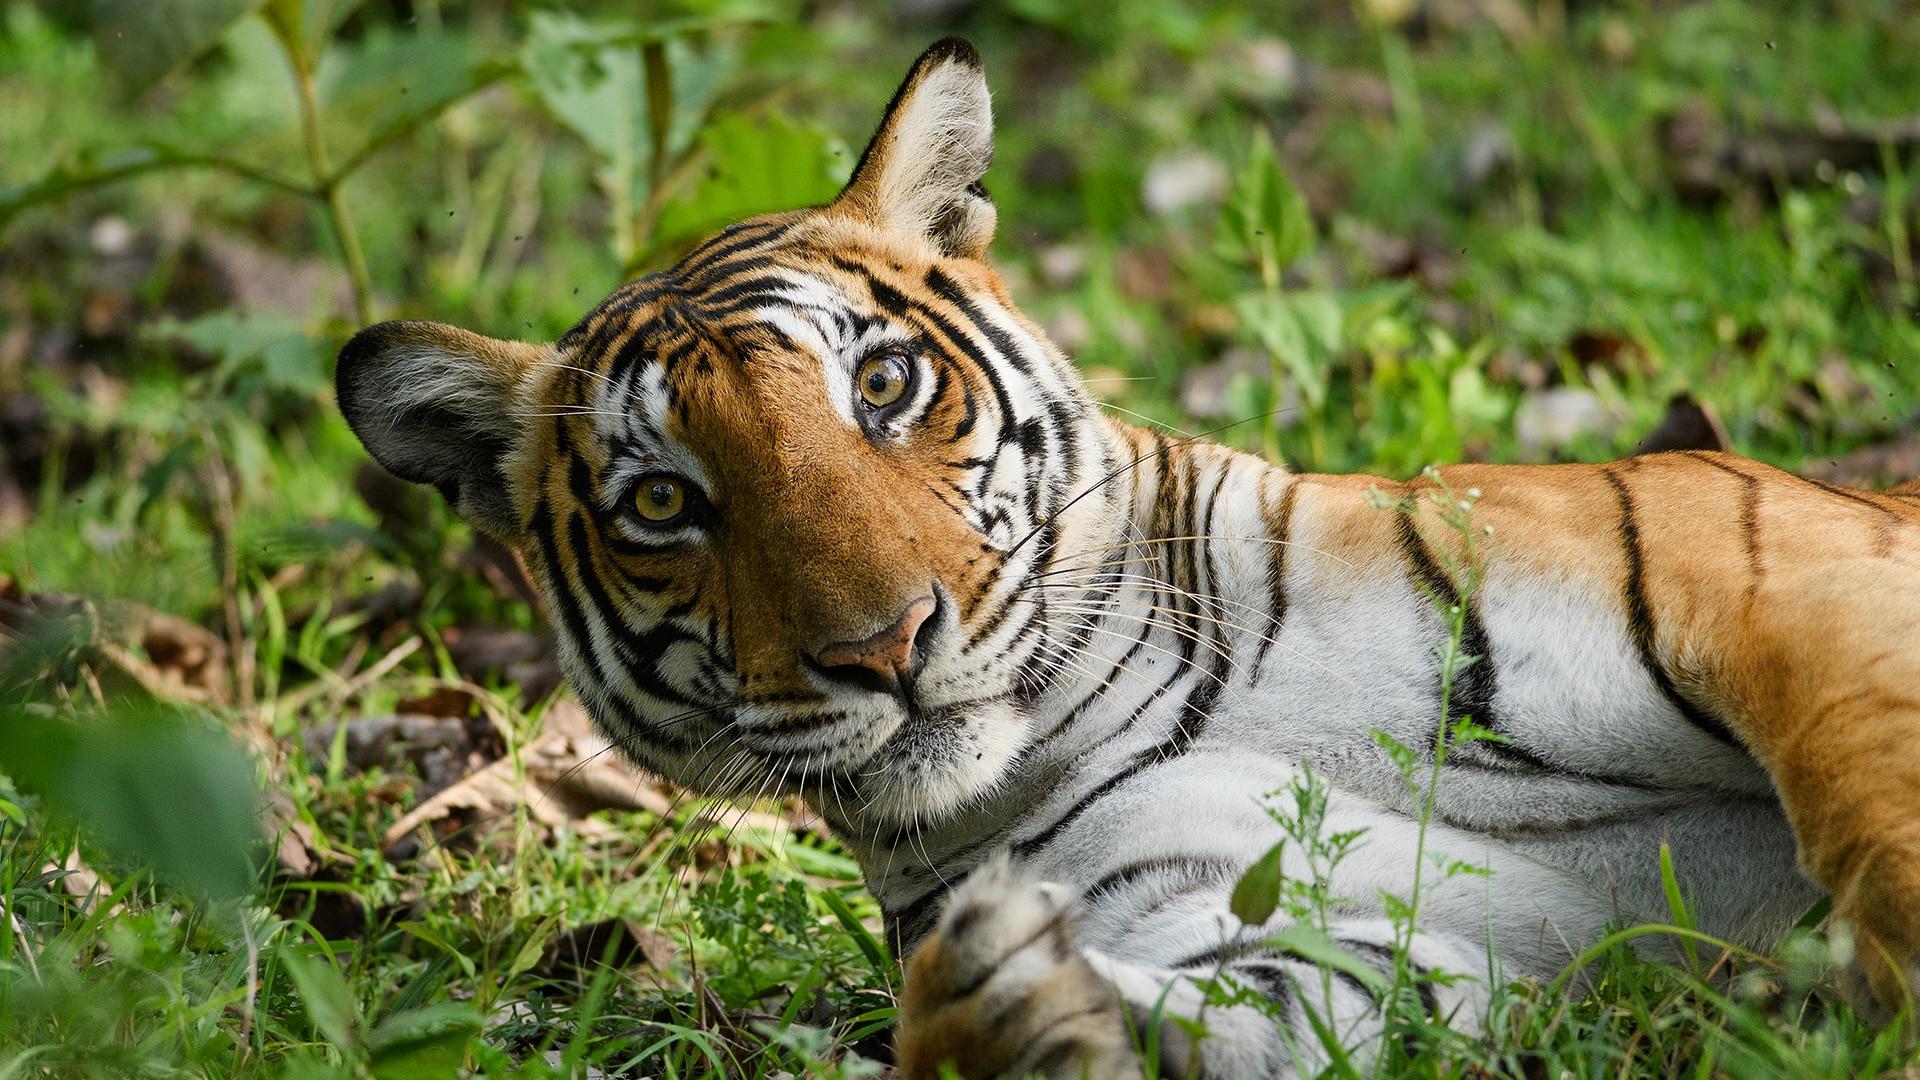 Tigers stares to camera in Kabini, Nagarhole Tiger Reserve, Karnataka, India